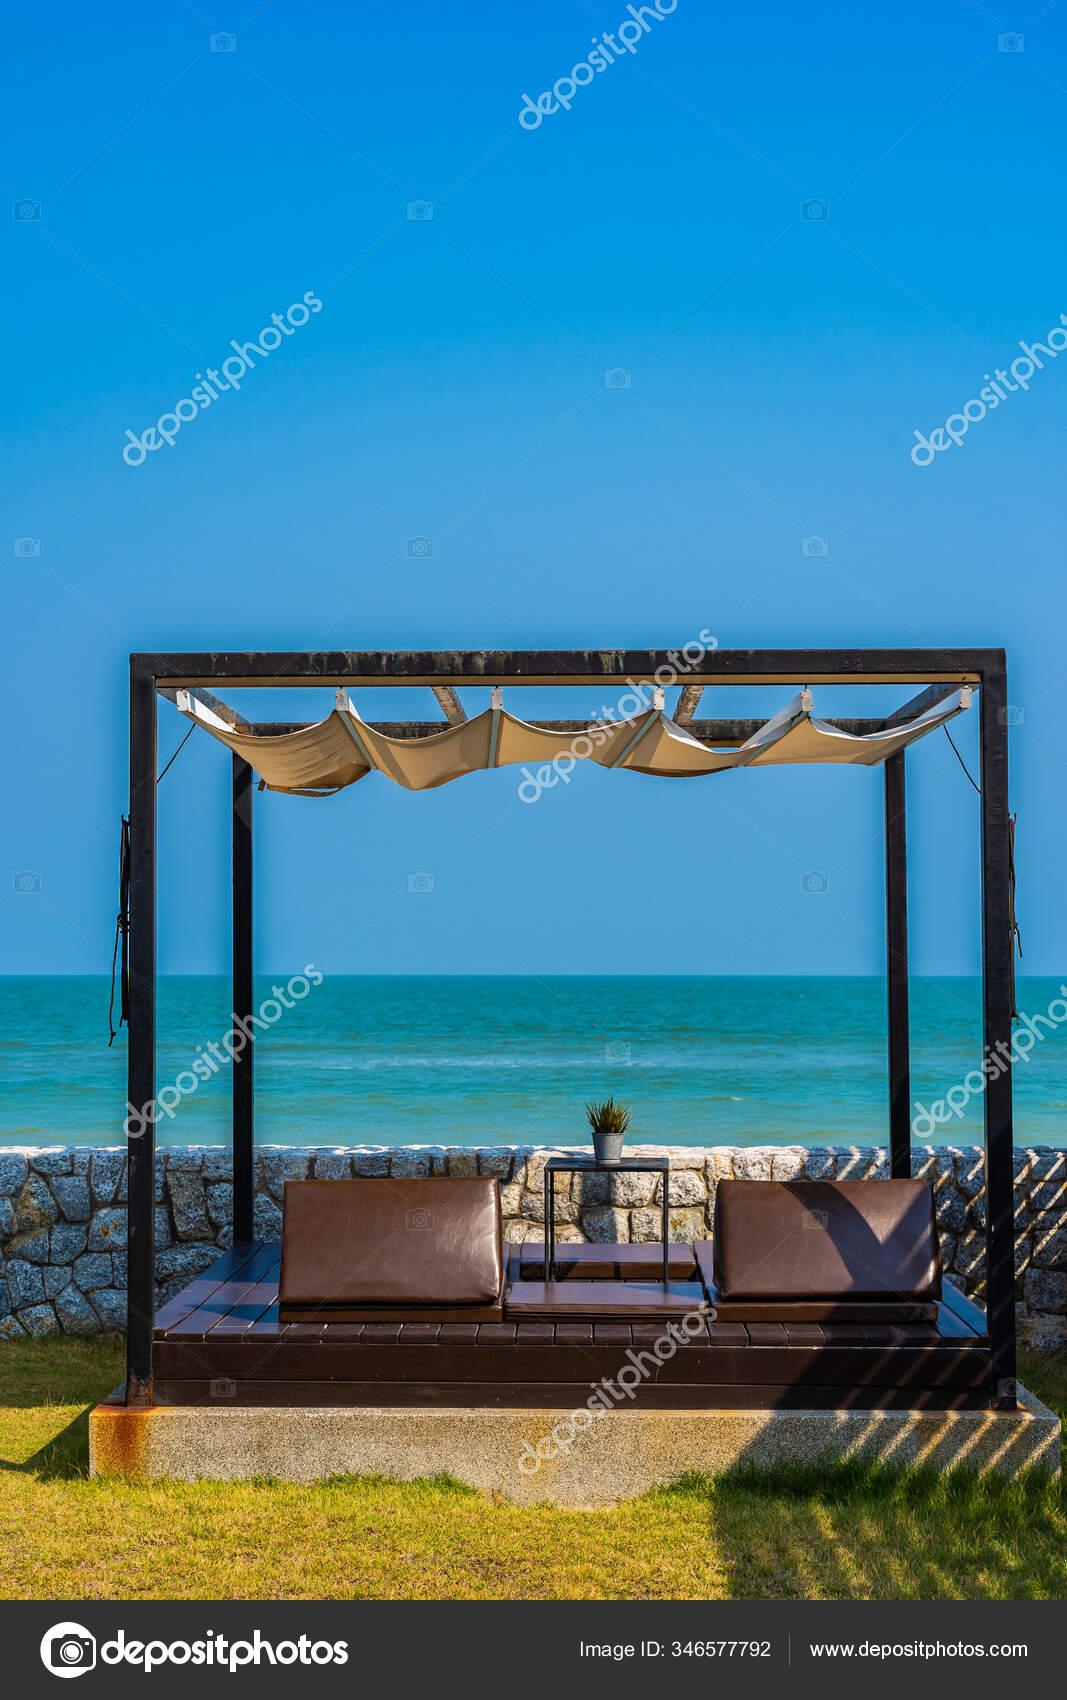 https depositphotos com 346577792 stock photo pillow sofa bed lounge beach html